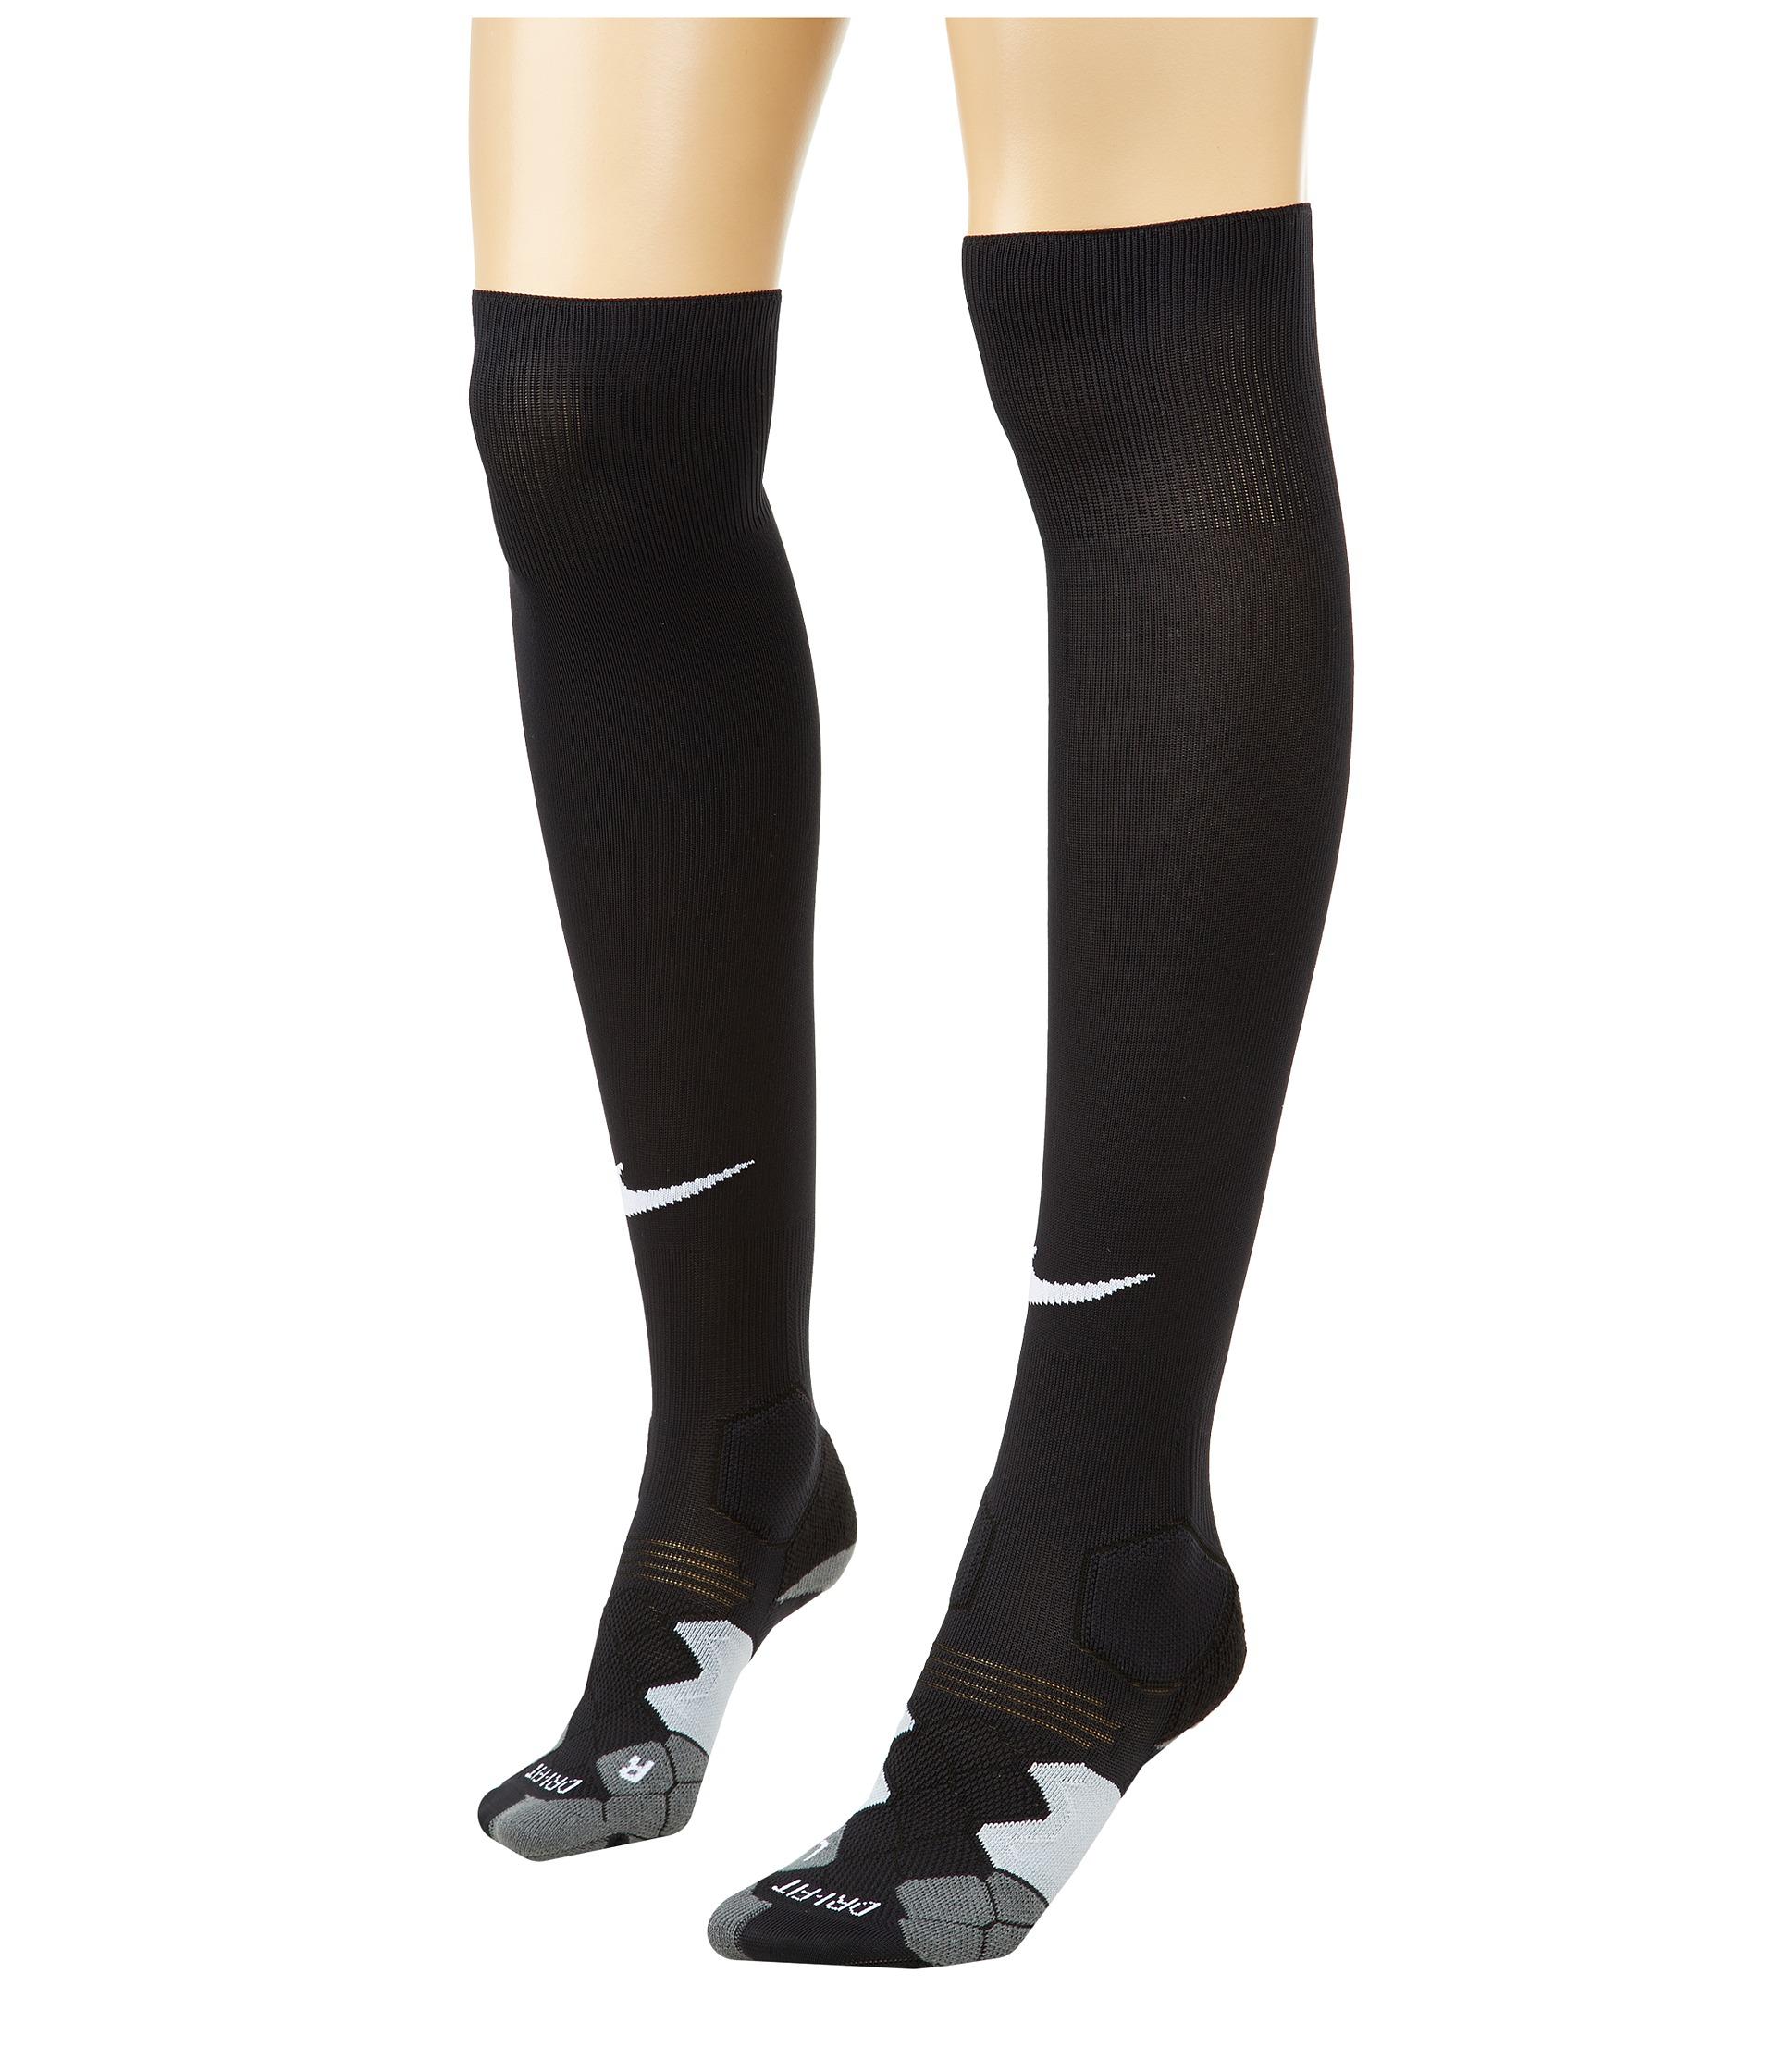 soccer socks deals on 1001 blocks